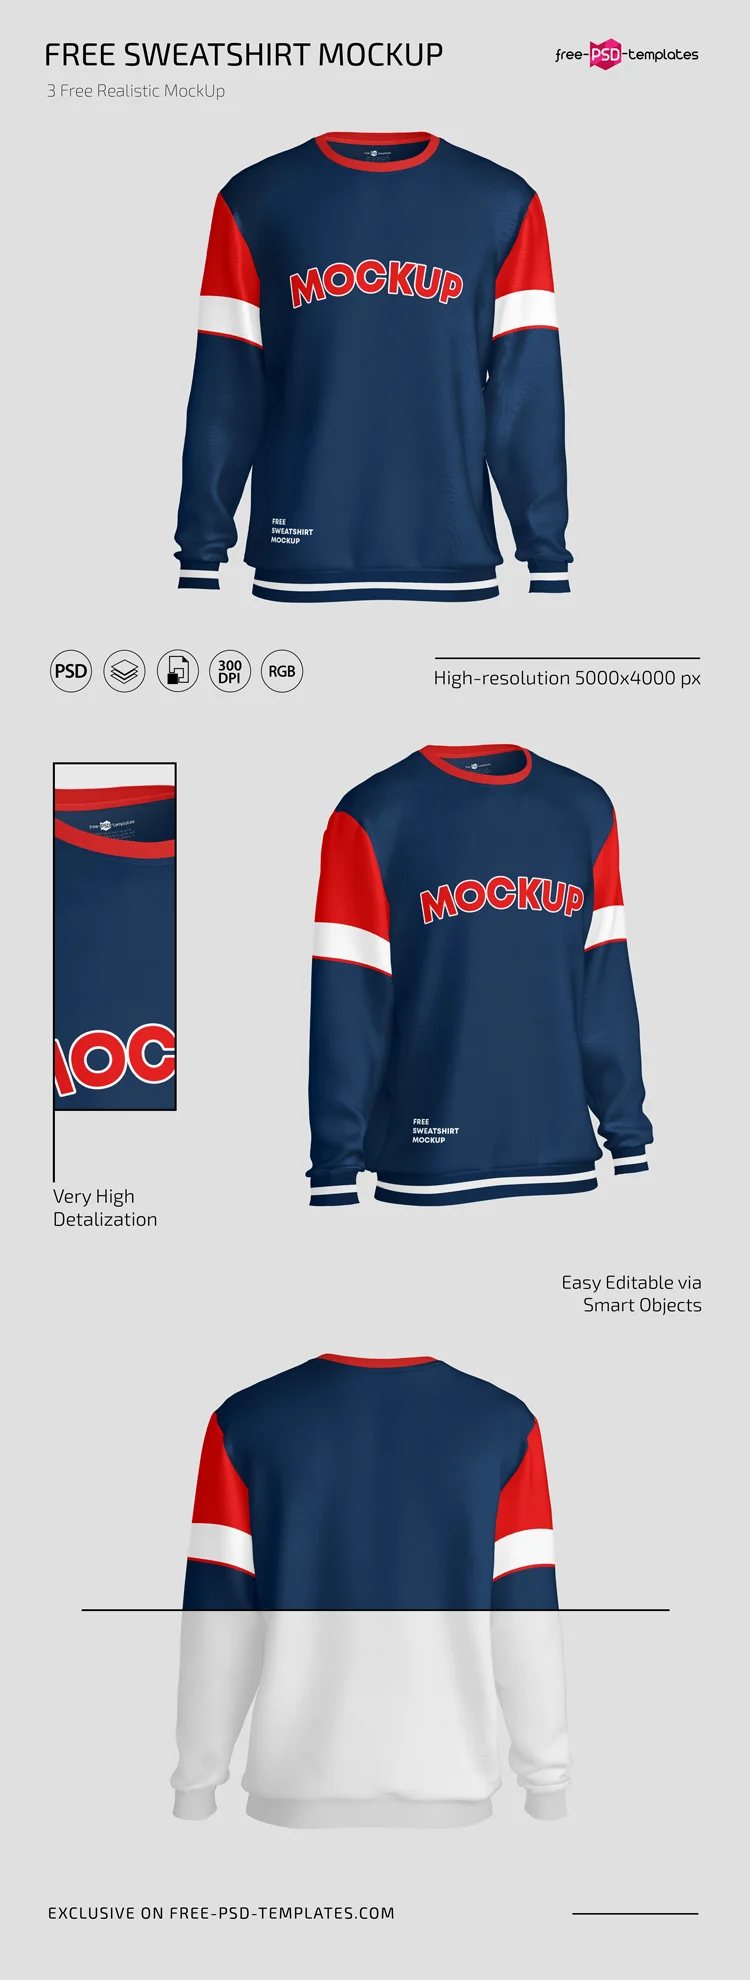 Free Sweatshirt Mockups In Psd Free Psd Templates Clothing Mockup Sweatshirts Mockup